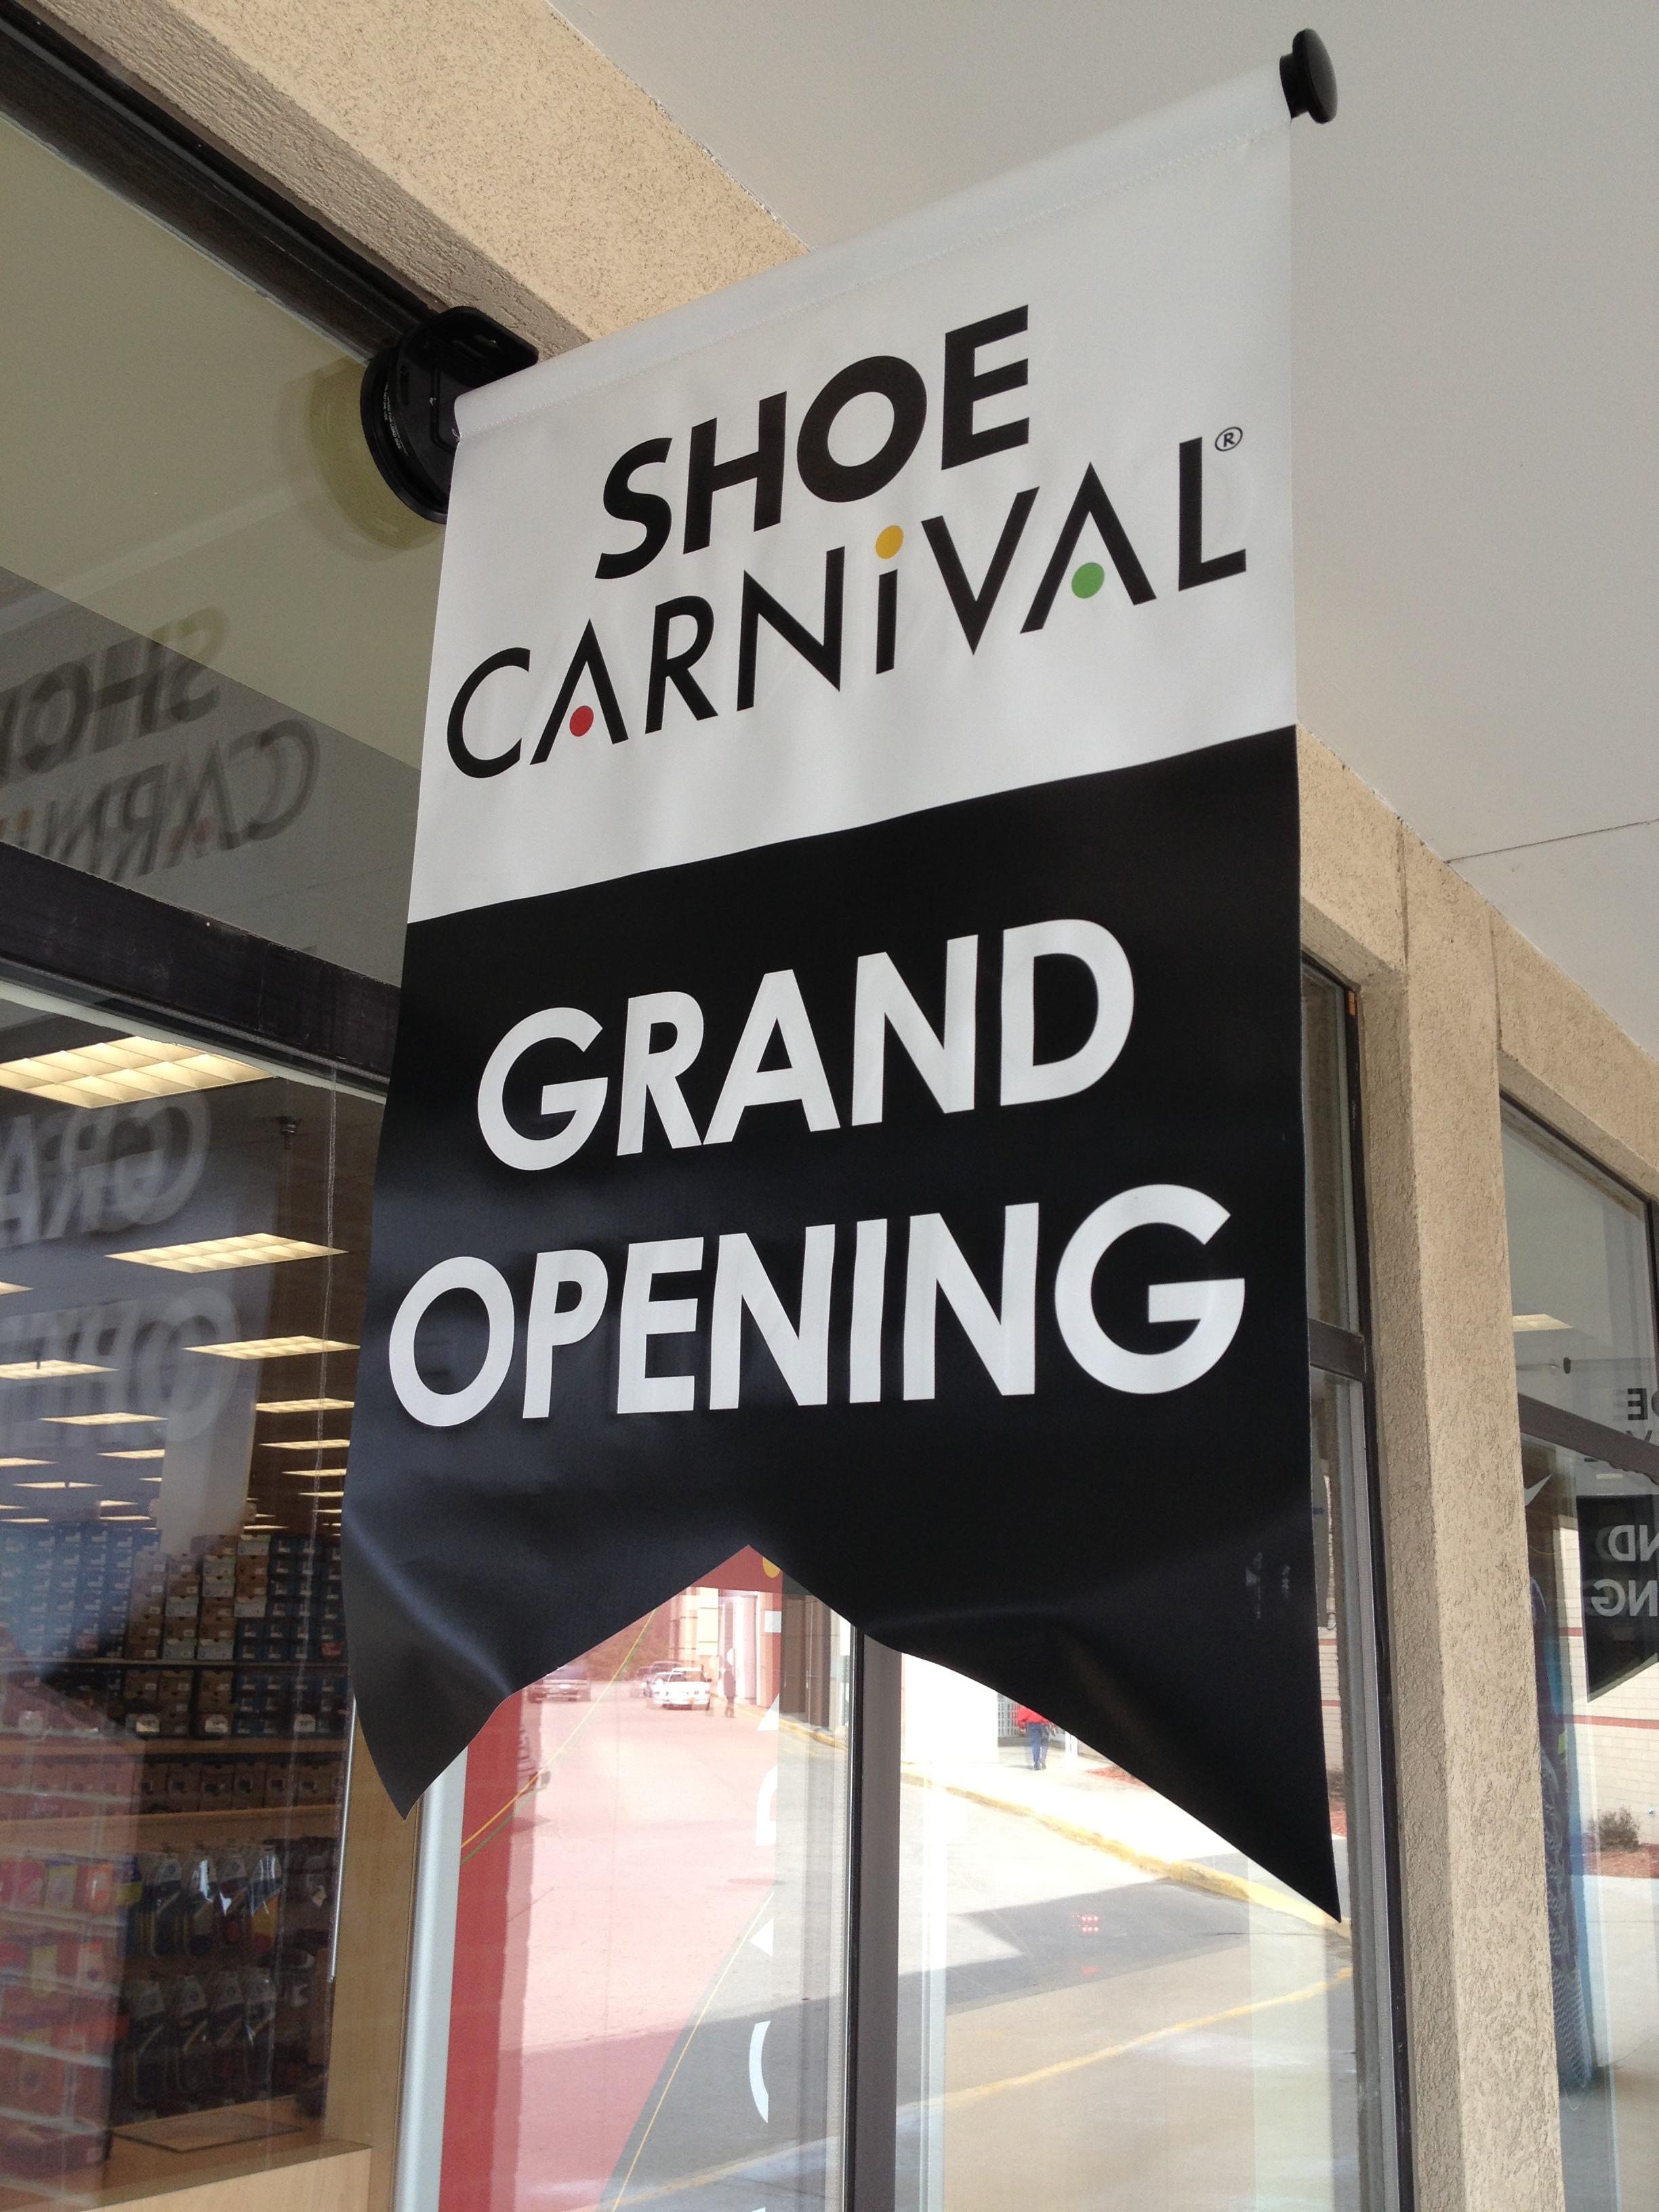 Family Footwear Retailer Shoe Carnival Announces 12 New